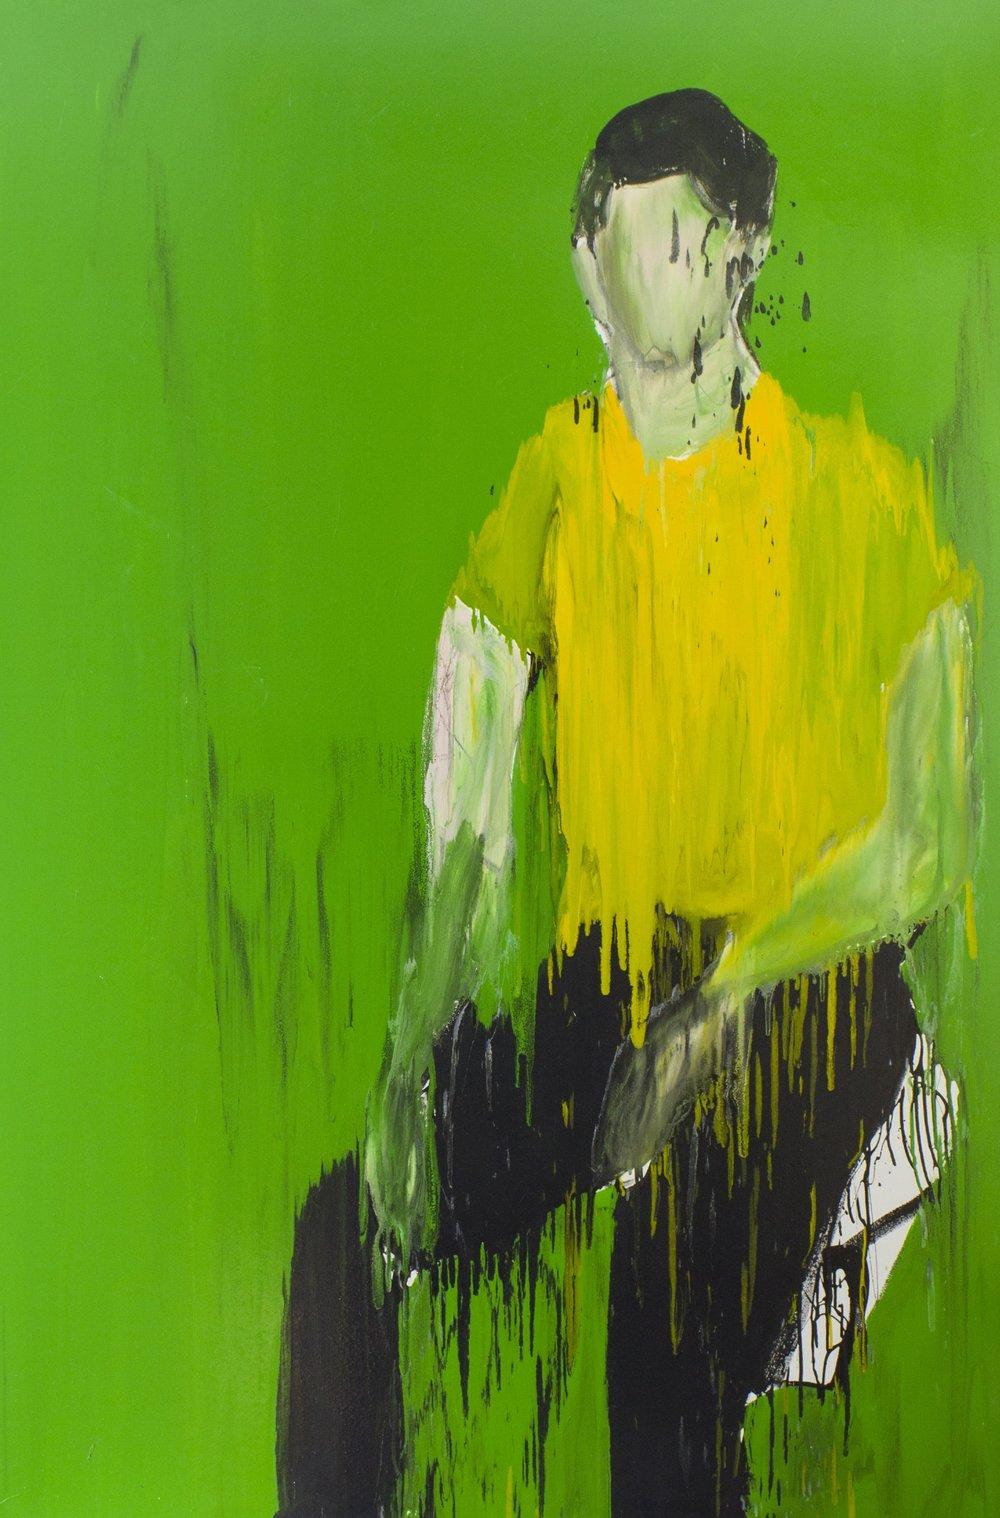 Nael I, 2018, enamel paint on canvas, 229 x 168 cm